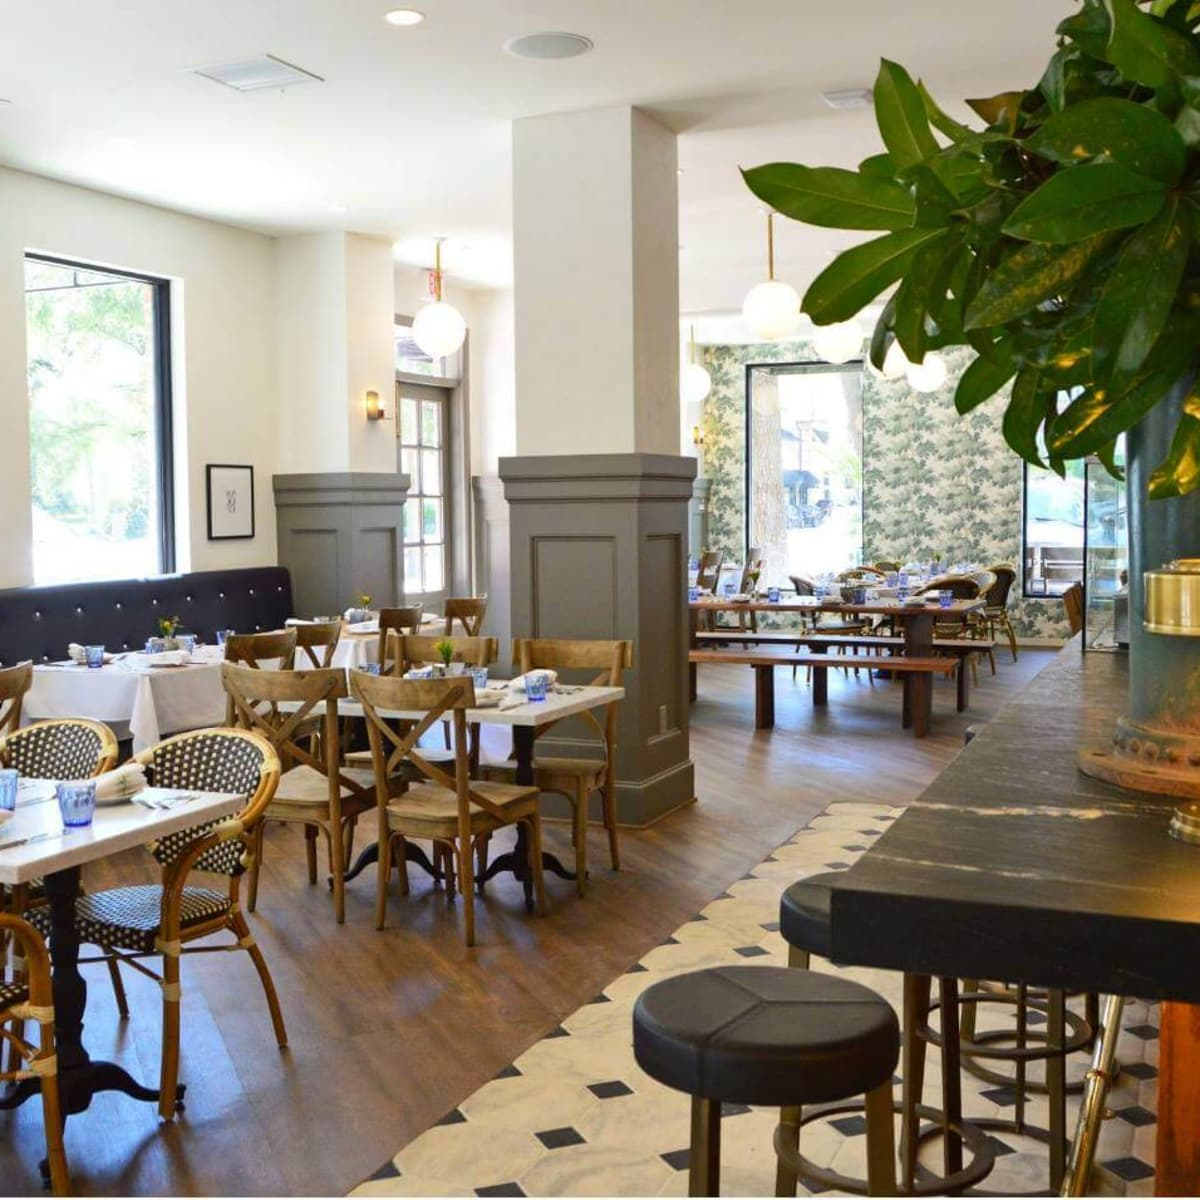 Houston_Eloise Nichols Grill & Liquors_interior_Dec 2016